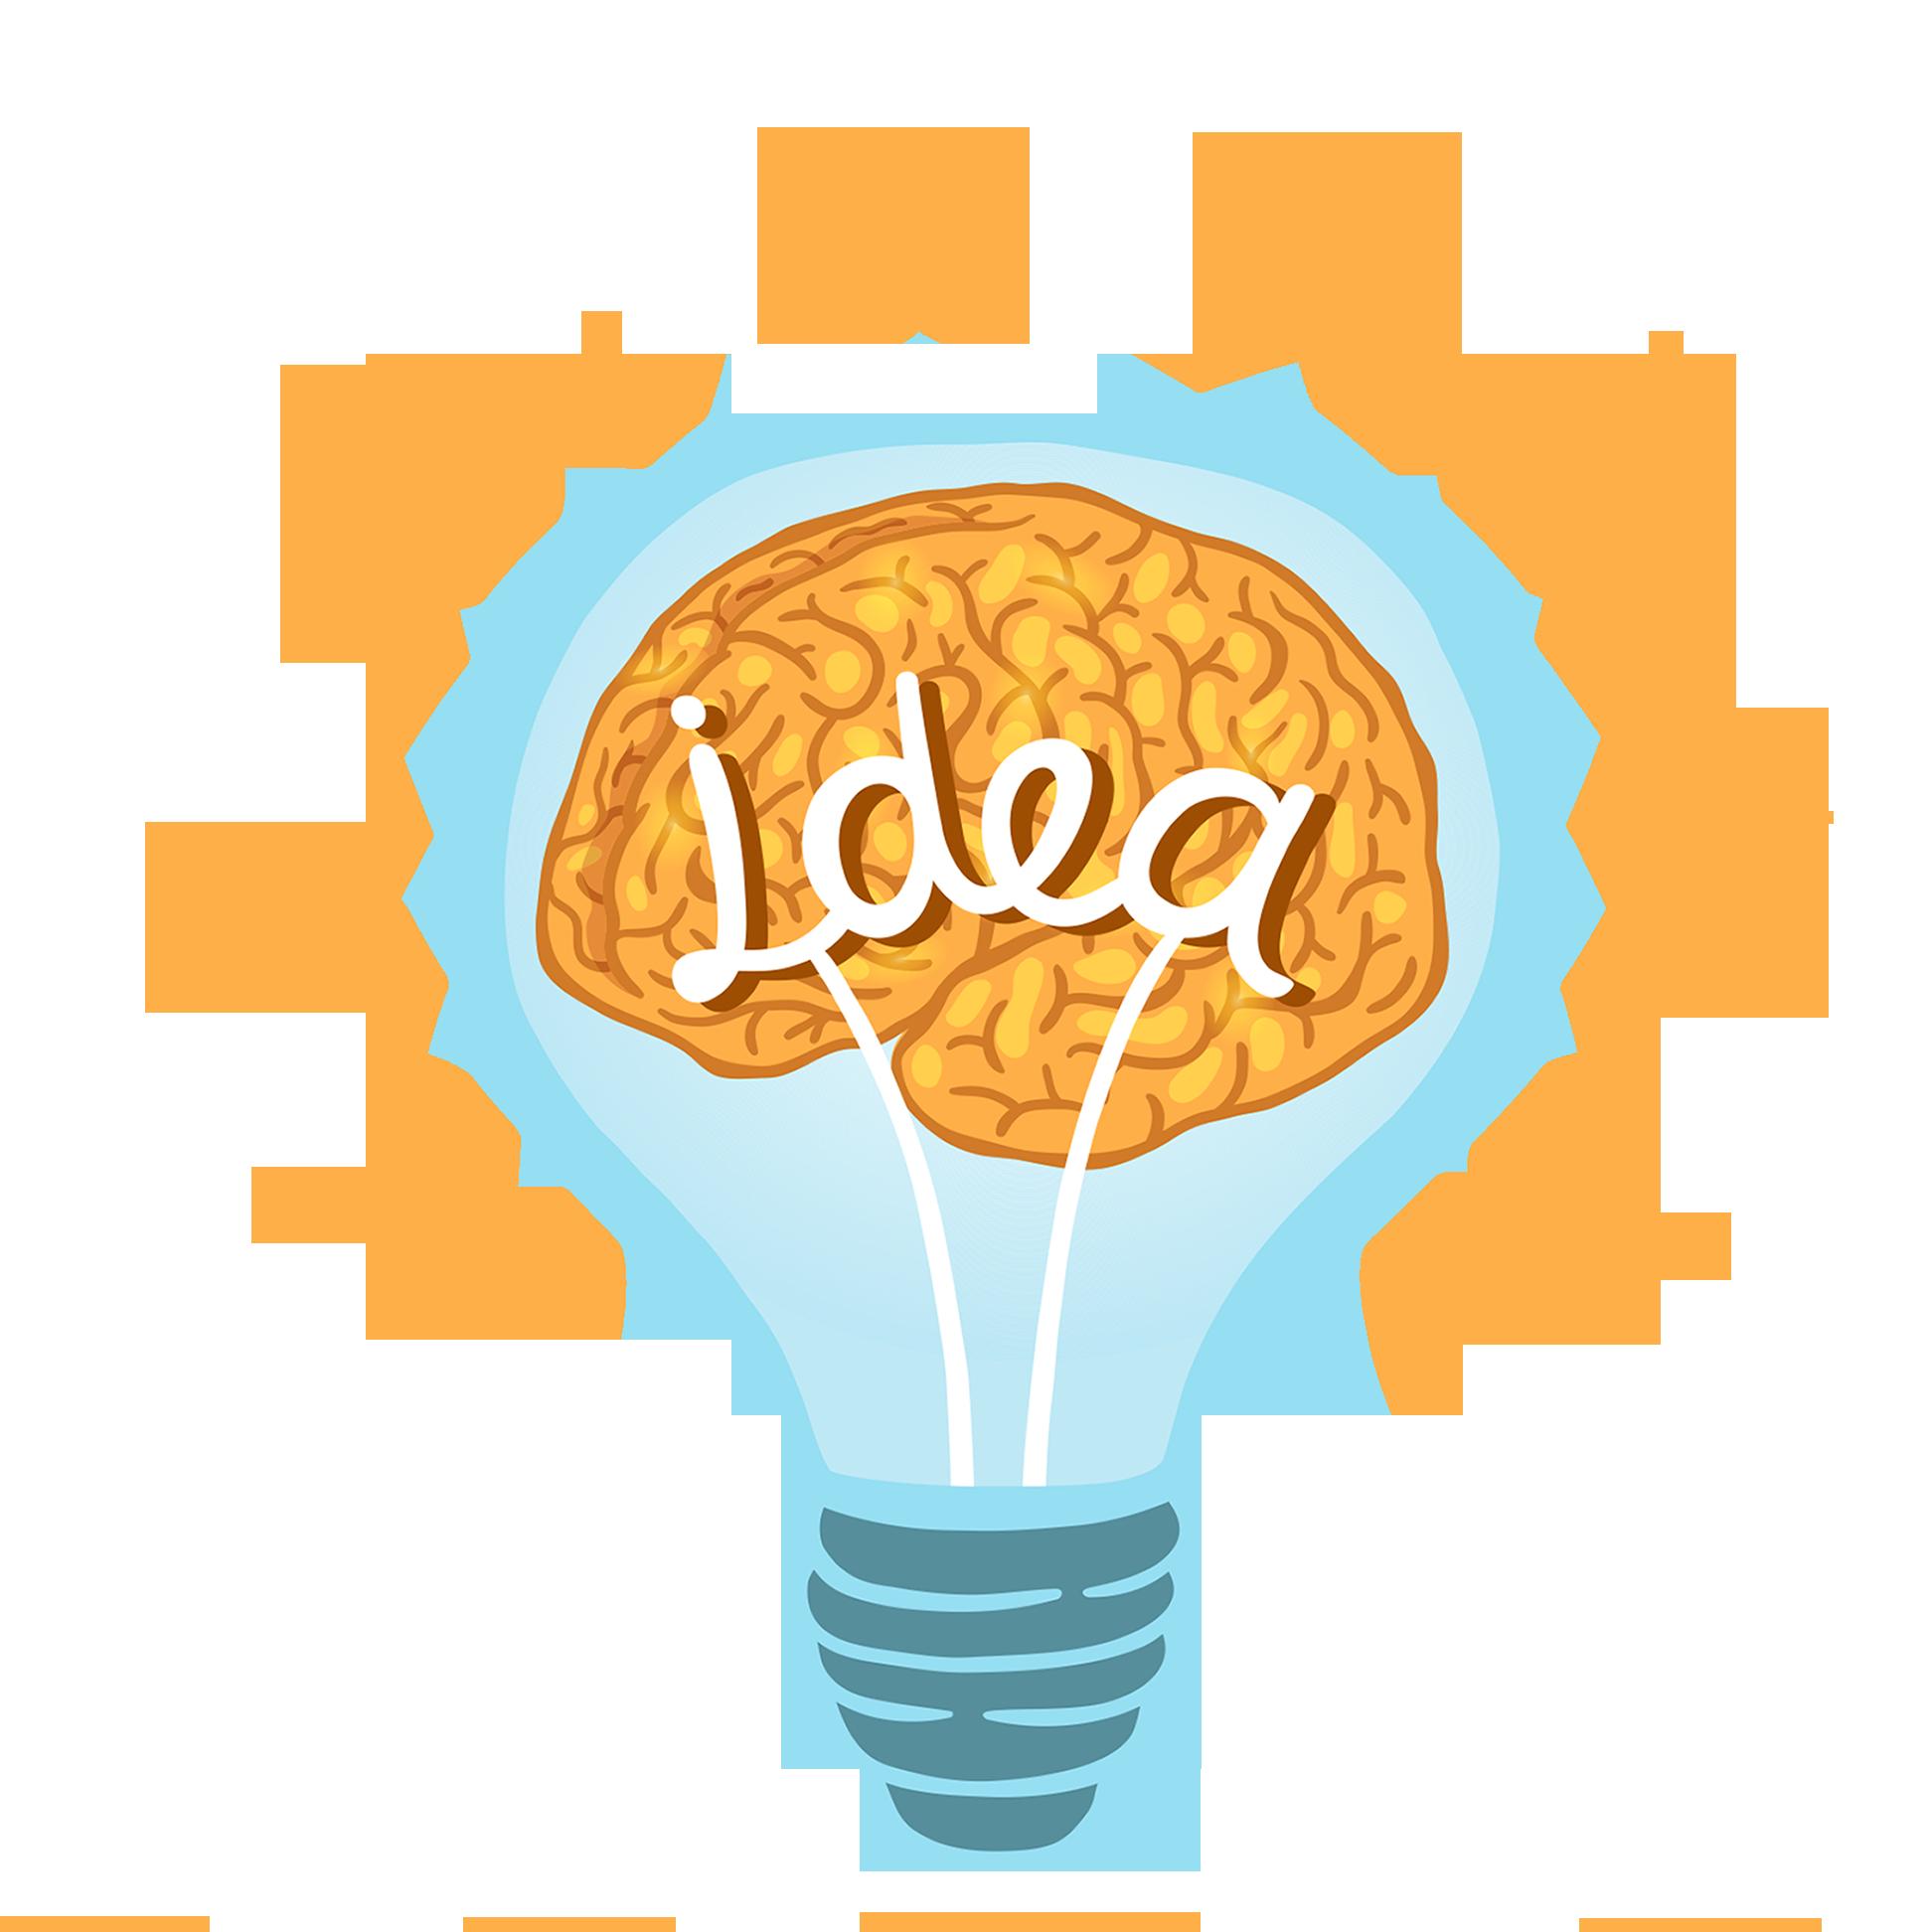 Idea clipart brain.  amazing decision making